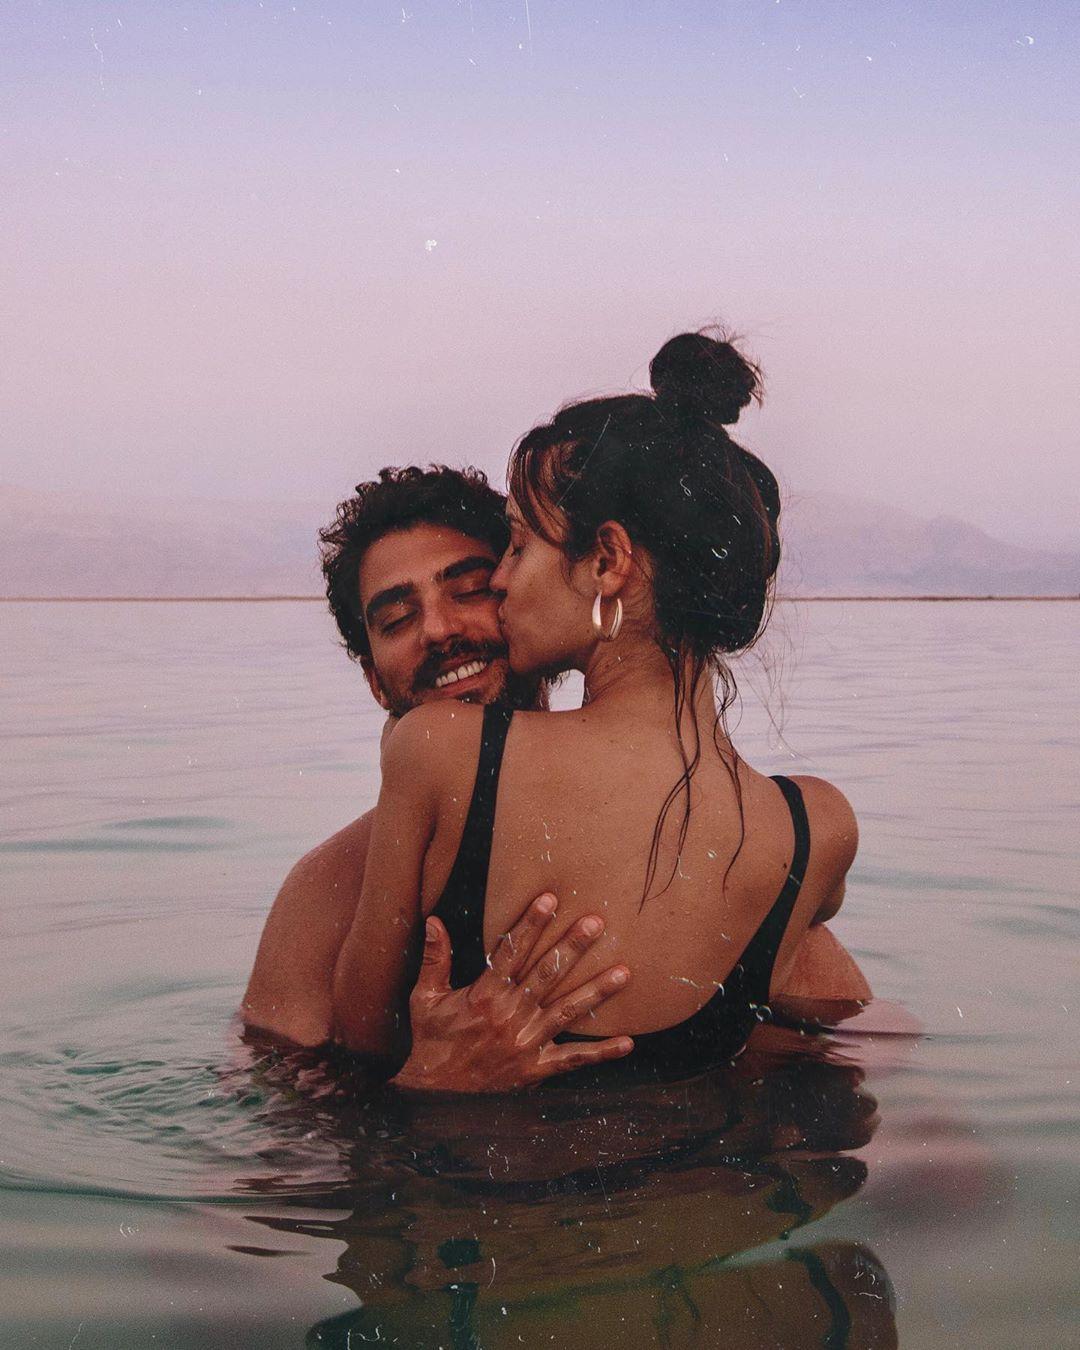 #deadsea #israel #love #couple #travel